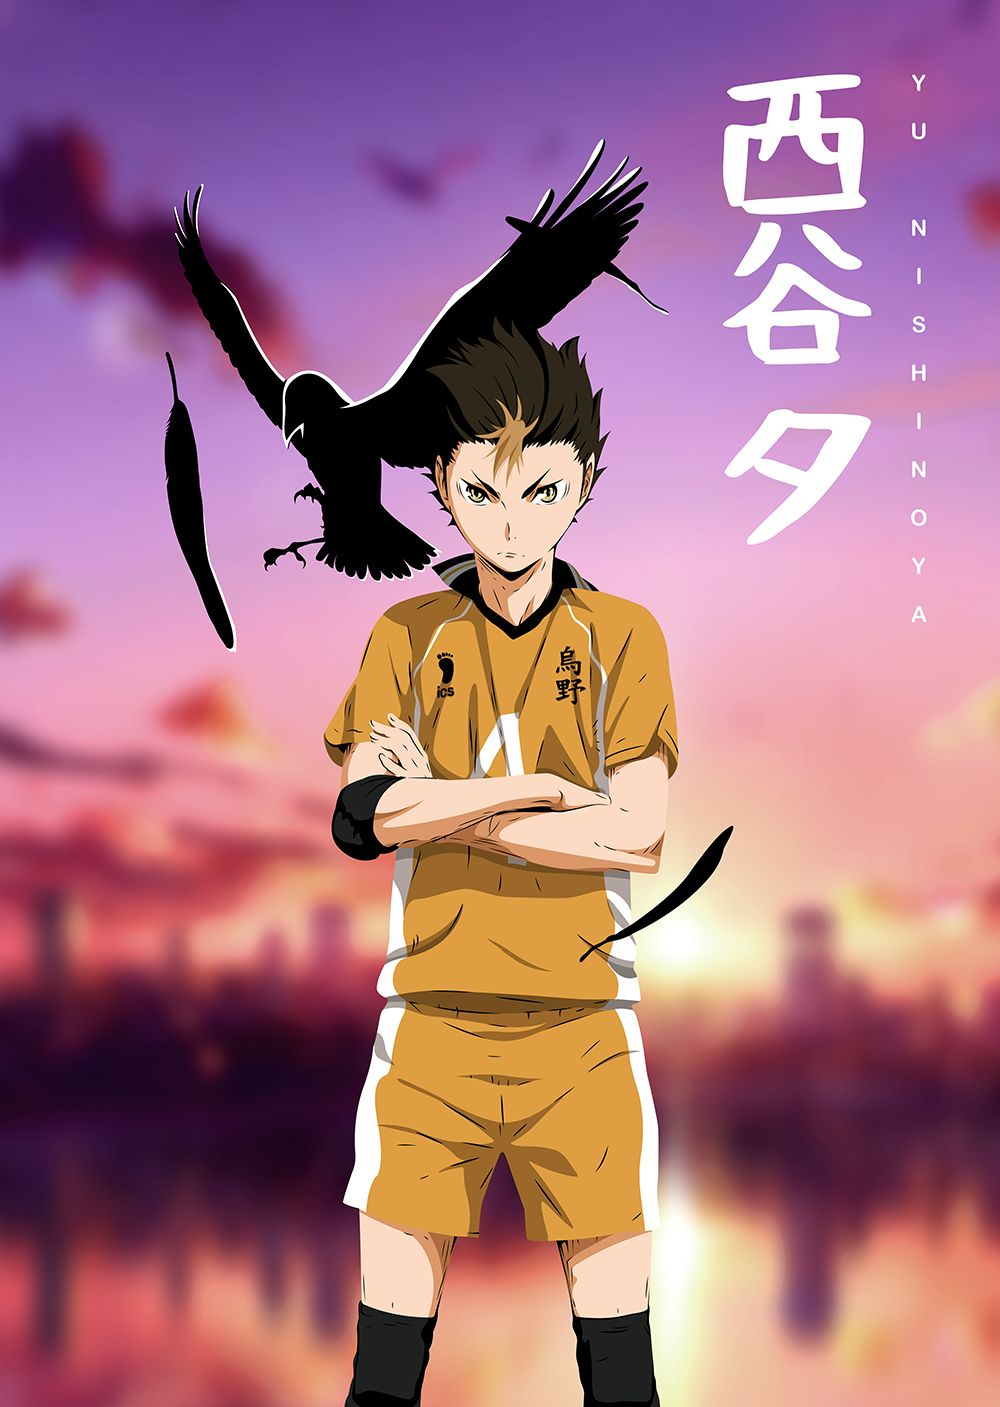 Anime Haikyuu Nishinoya 03 Anime & Manga Poster Print